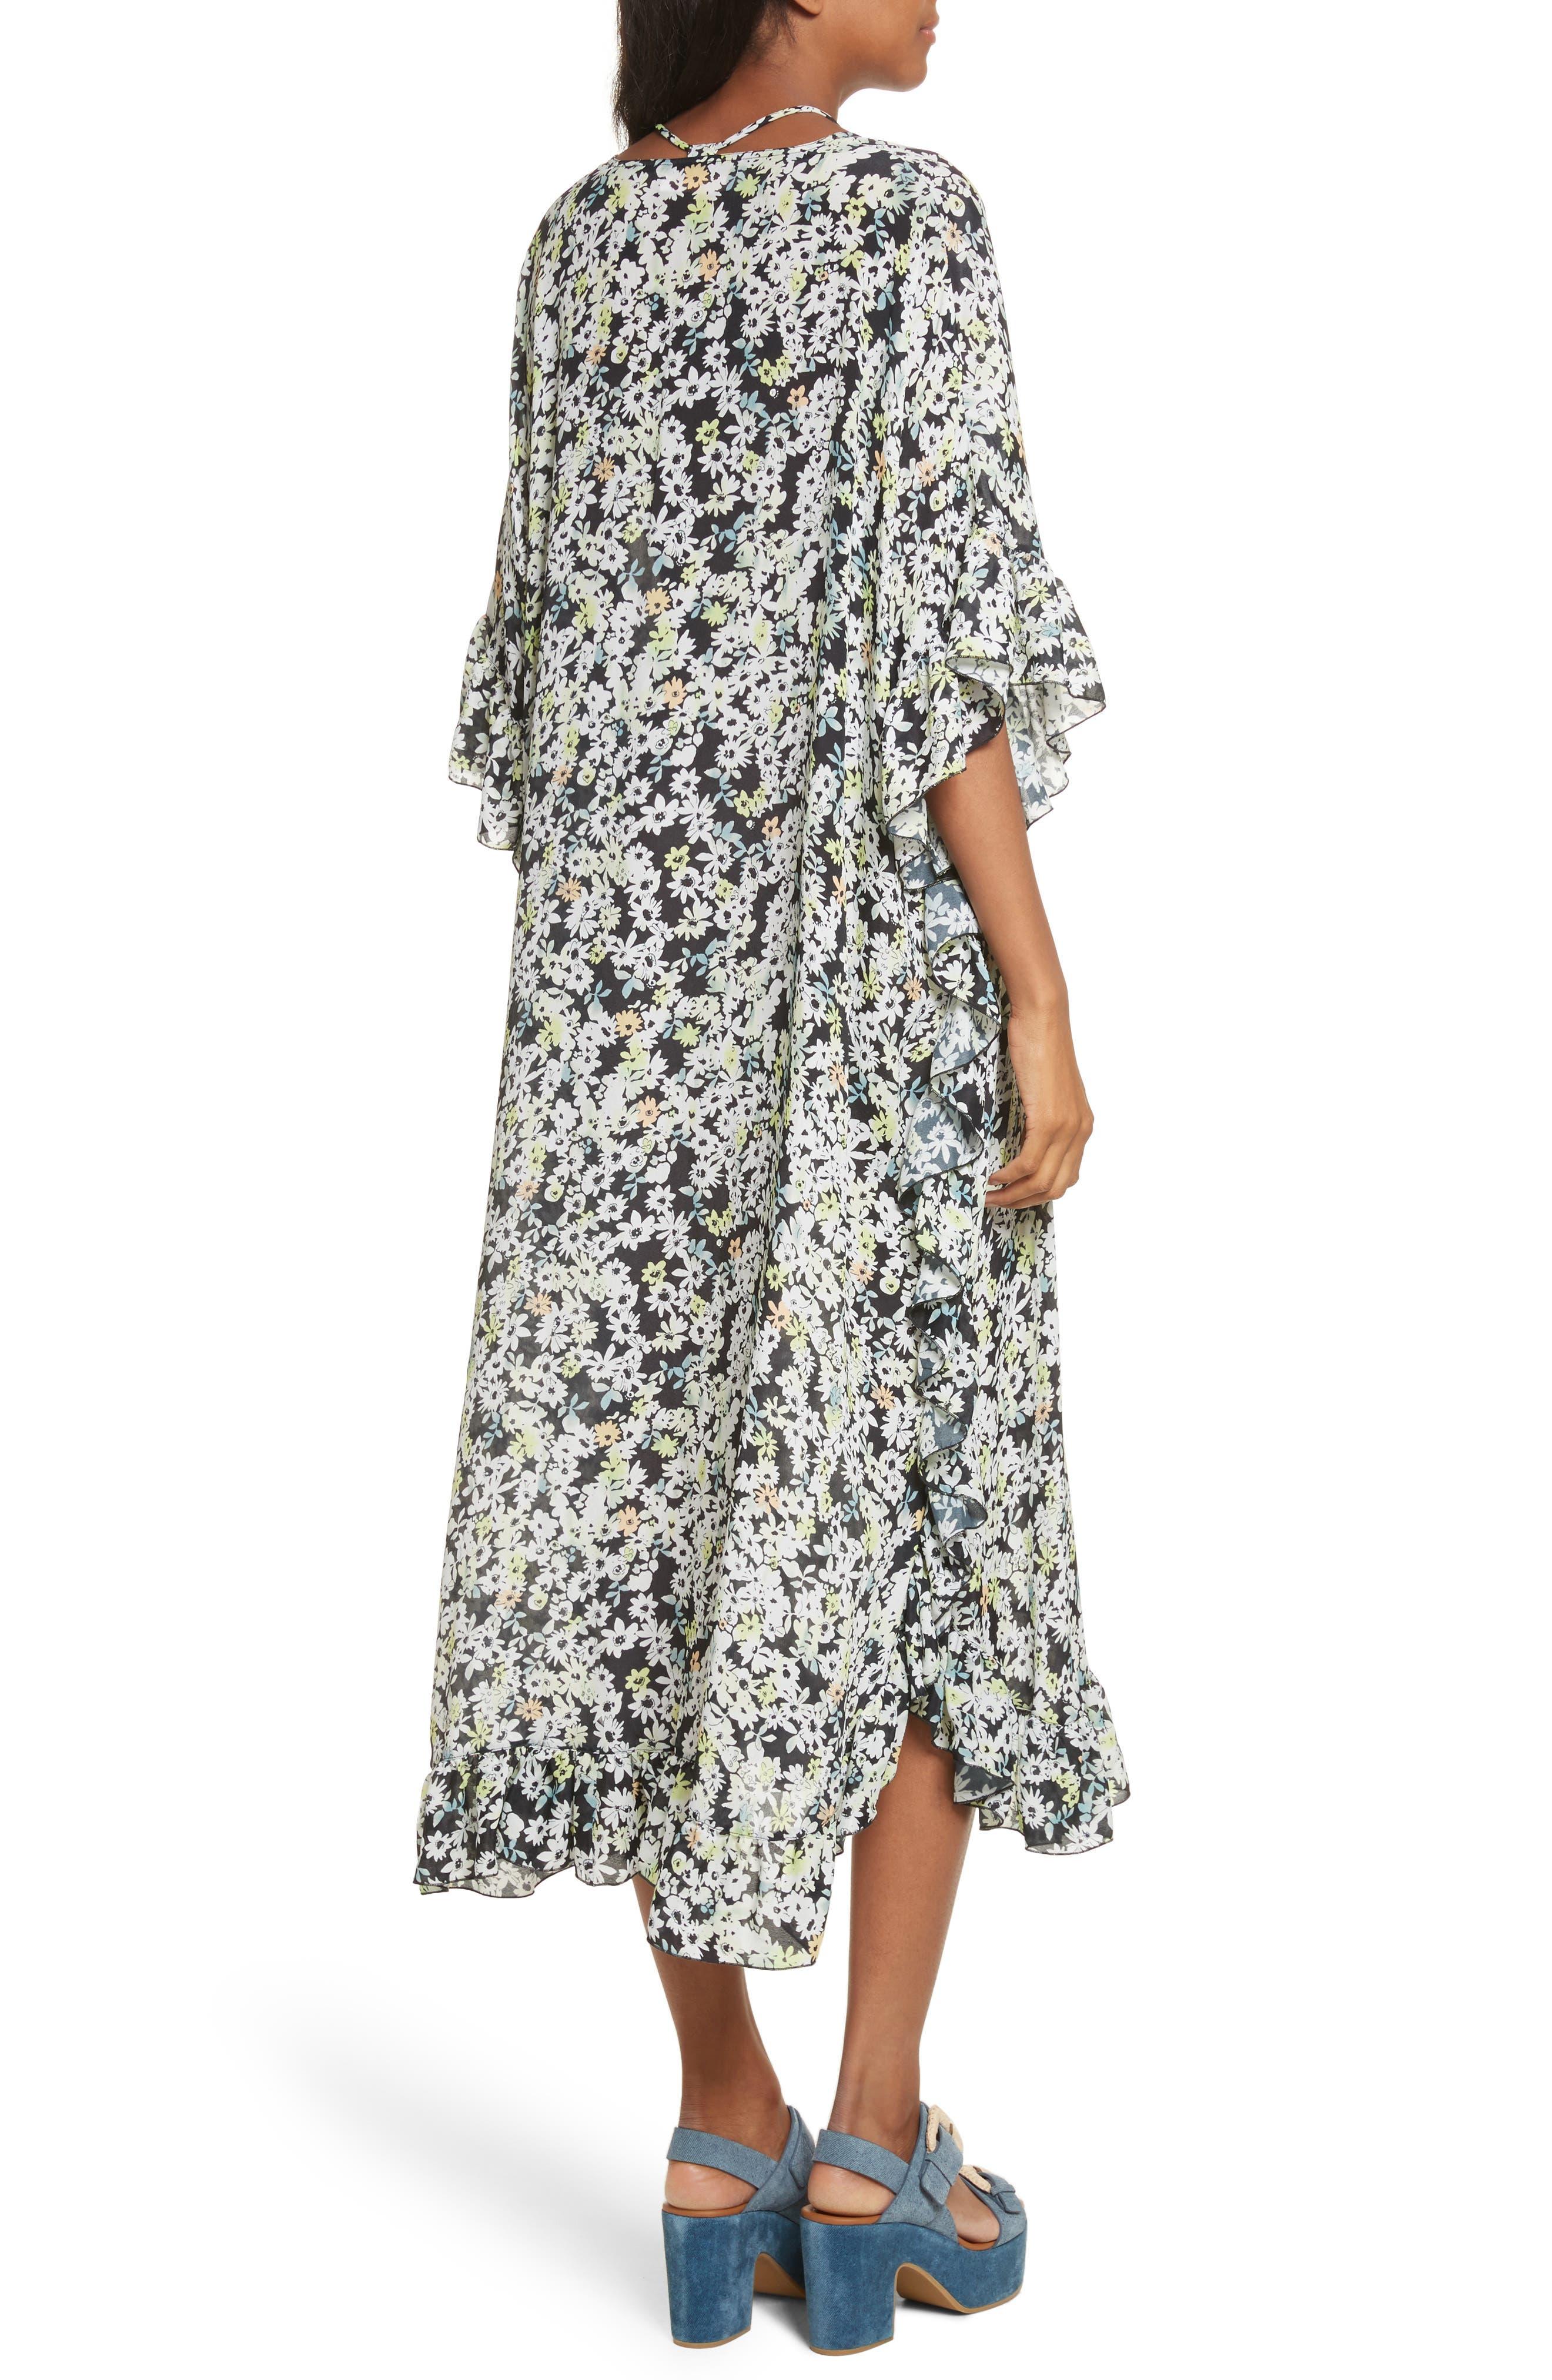 SEE BY CHLOÉ,                             Floral Print Flutter Edge Dress,                             Alternate thumbnail 2, color,                             021